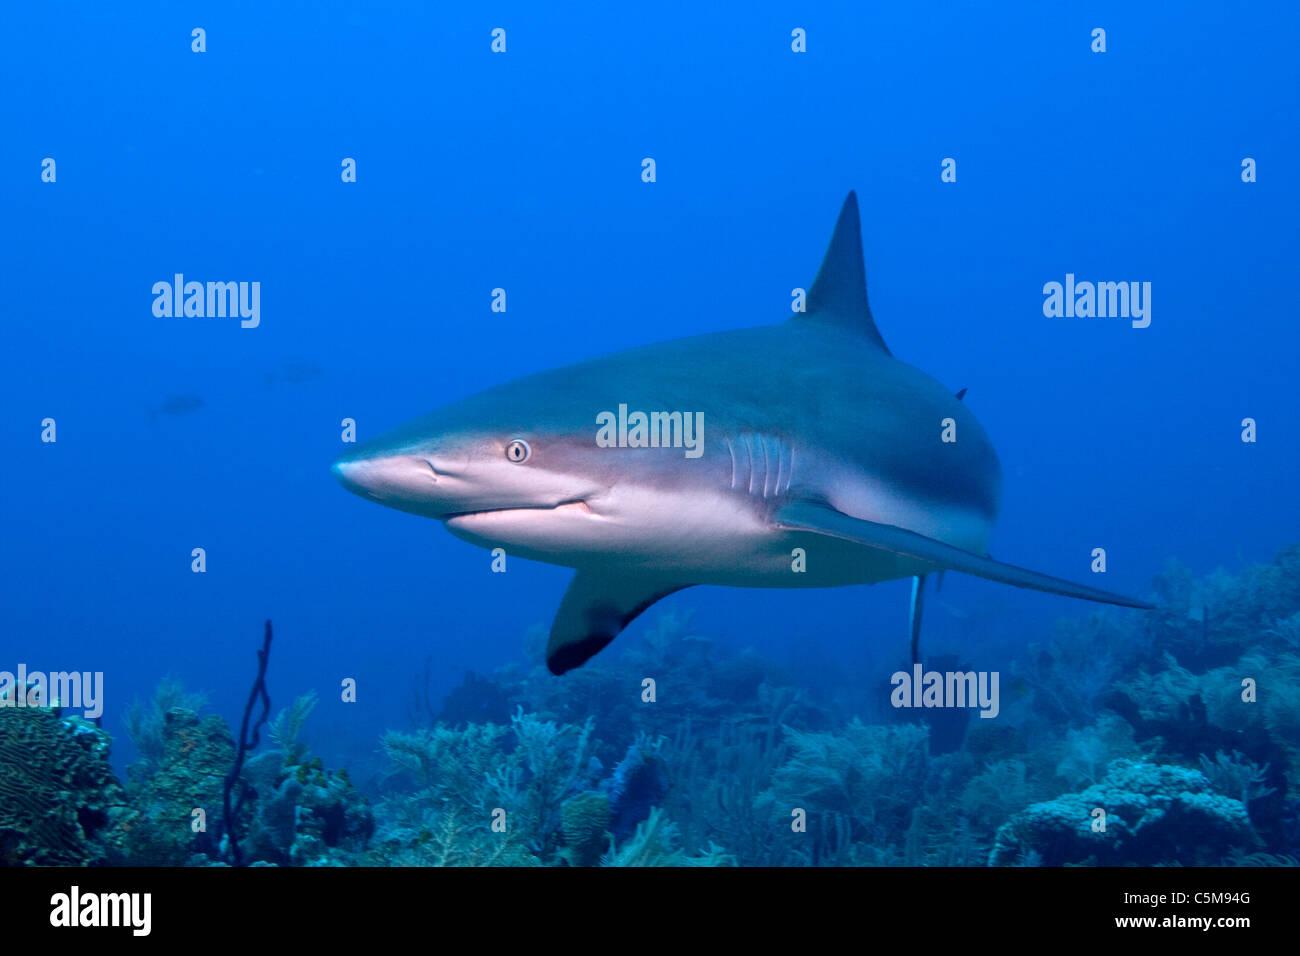 A Caribbean Reef Shark swims by a diver at Roatan,off the coast of Honduras. Stock Photo